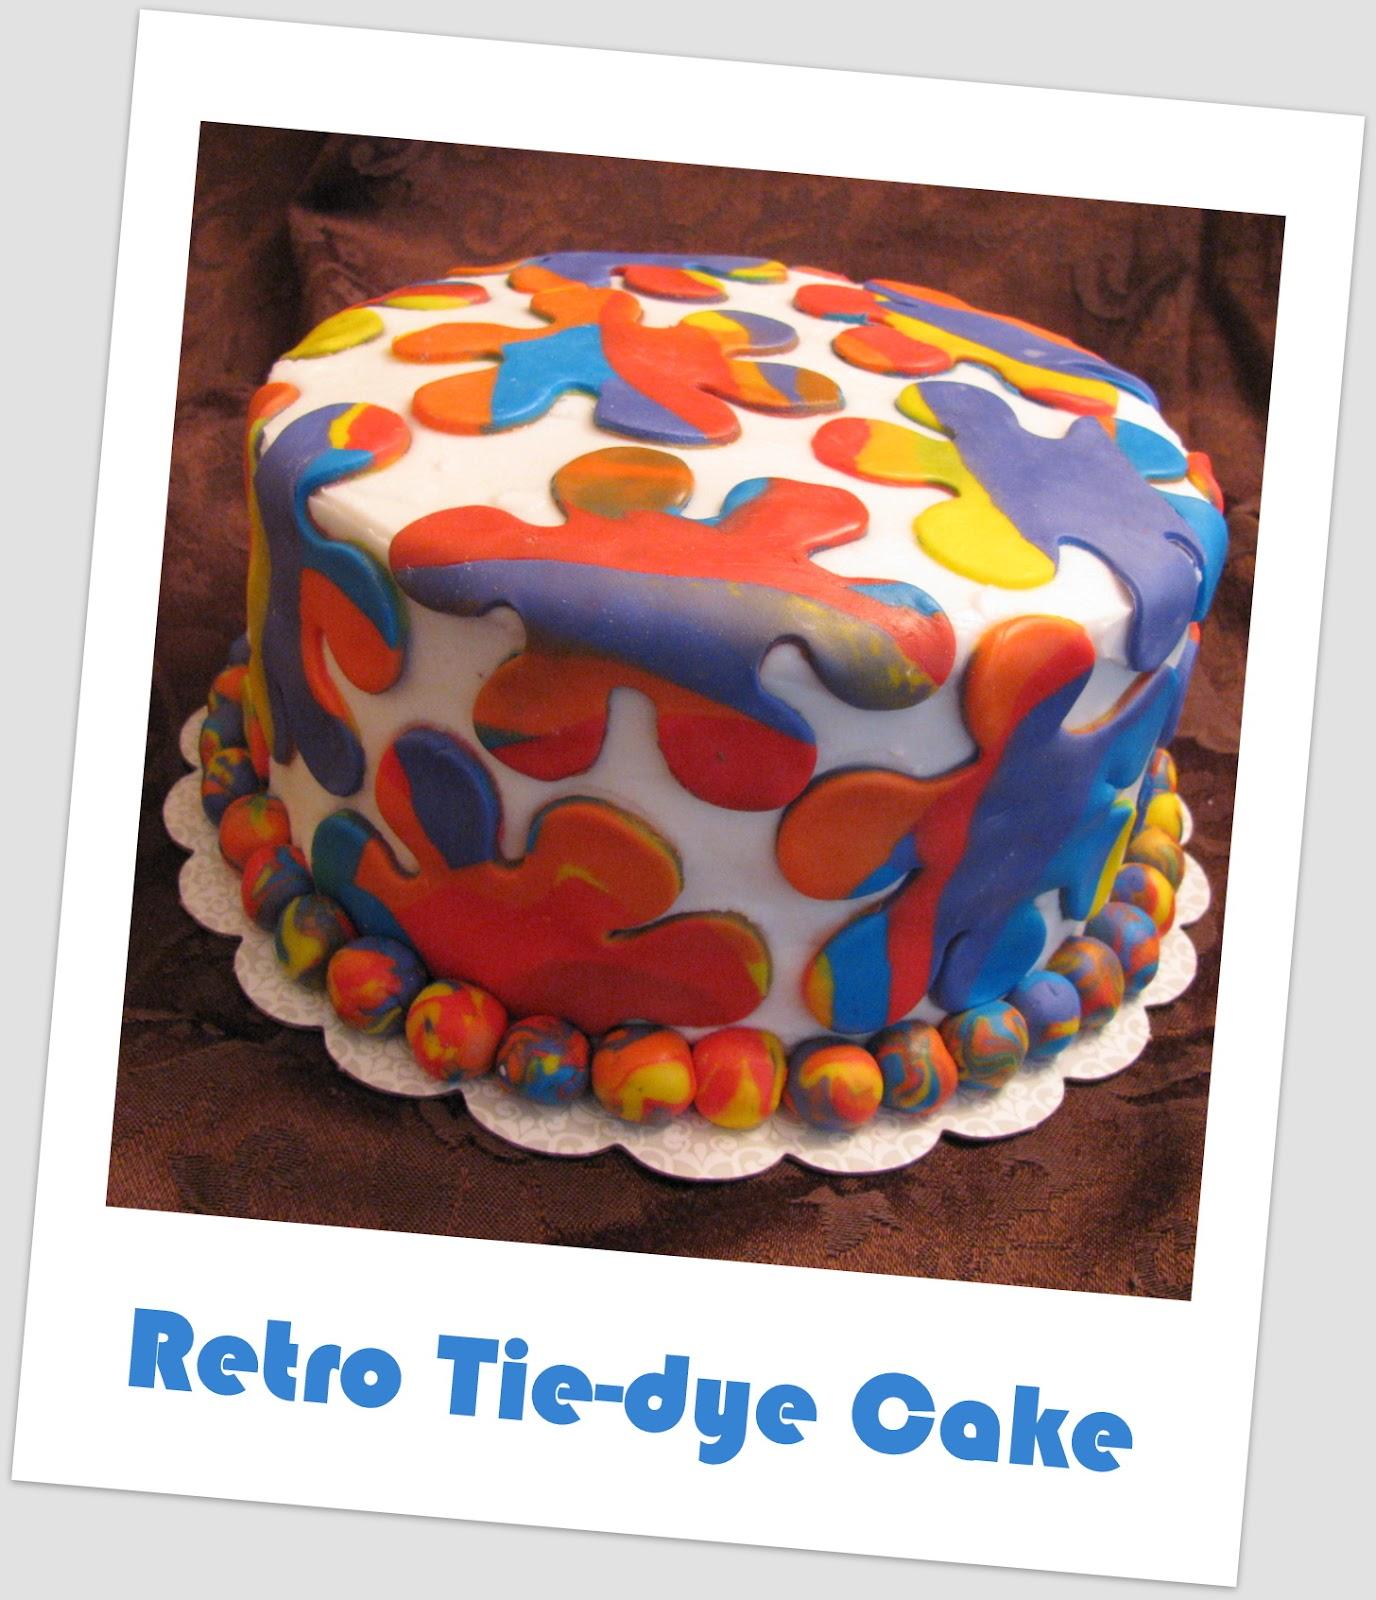 Retro Tie Dye Cake